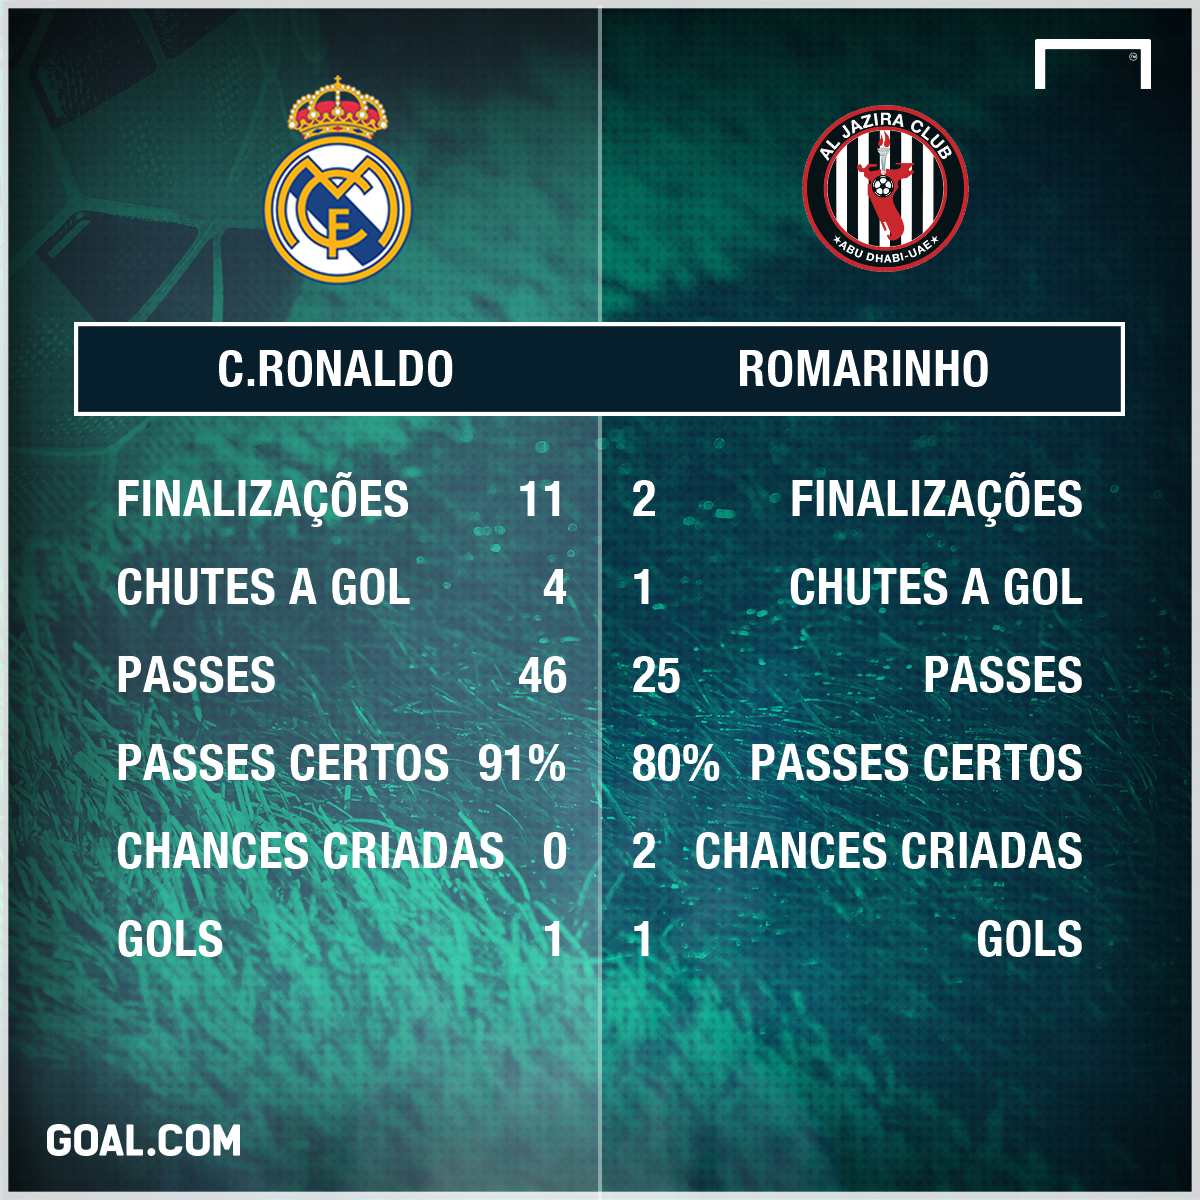 GFX Cristiano Ronaldo vs Romarinho